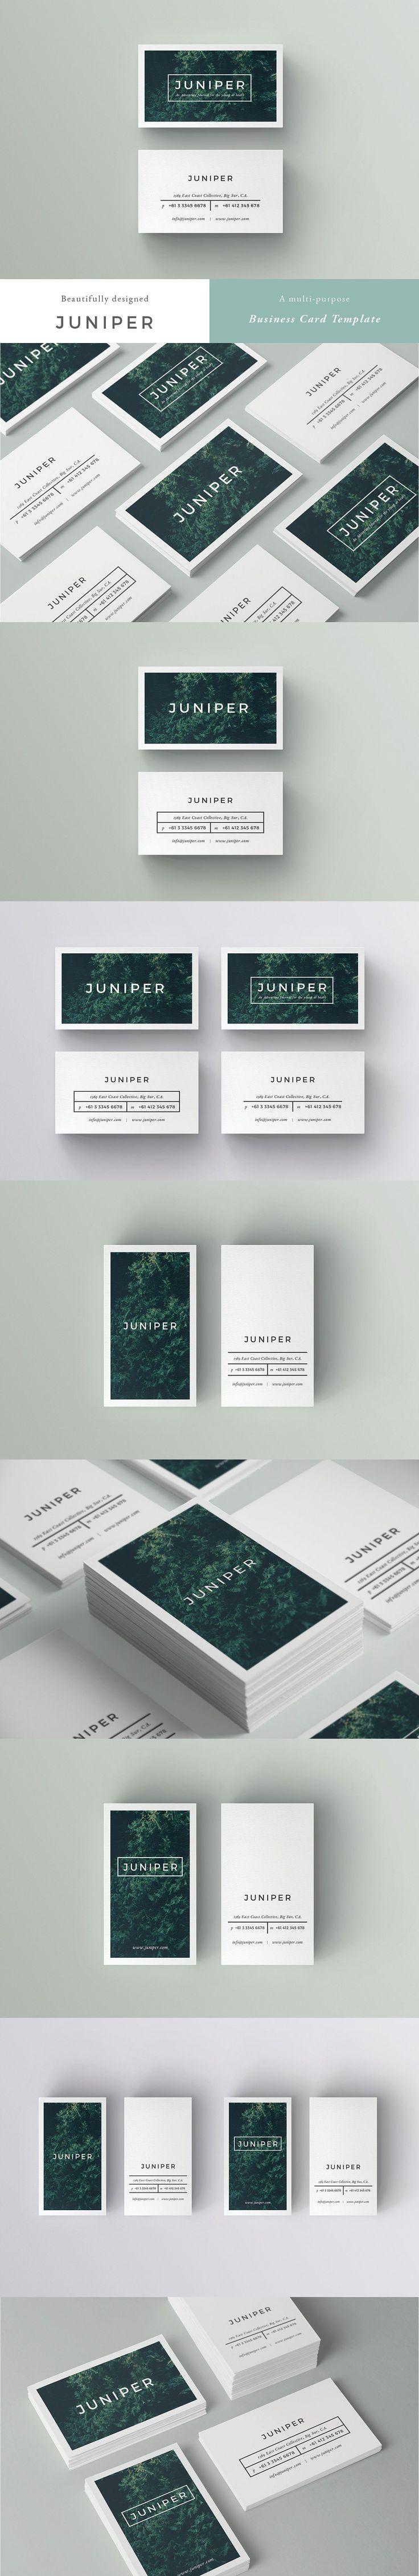 149 Best Carte De Visite Images On Pinterest Business Card Design